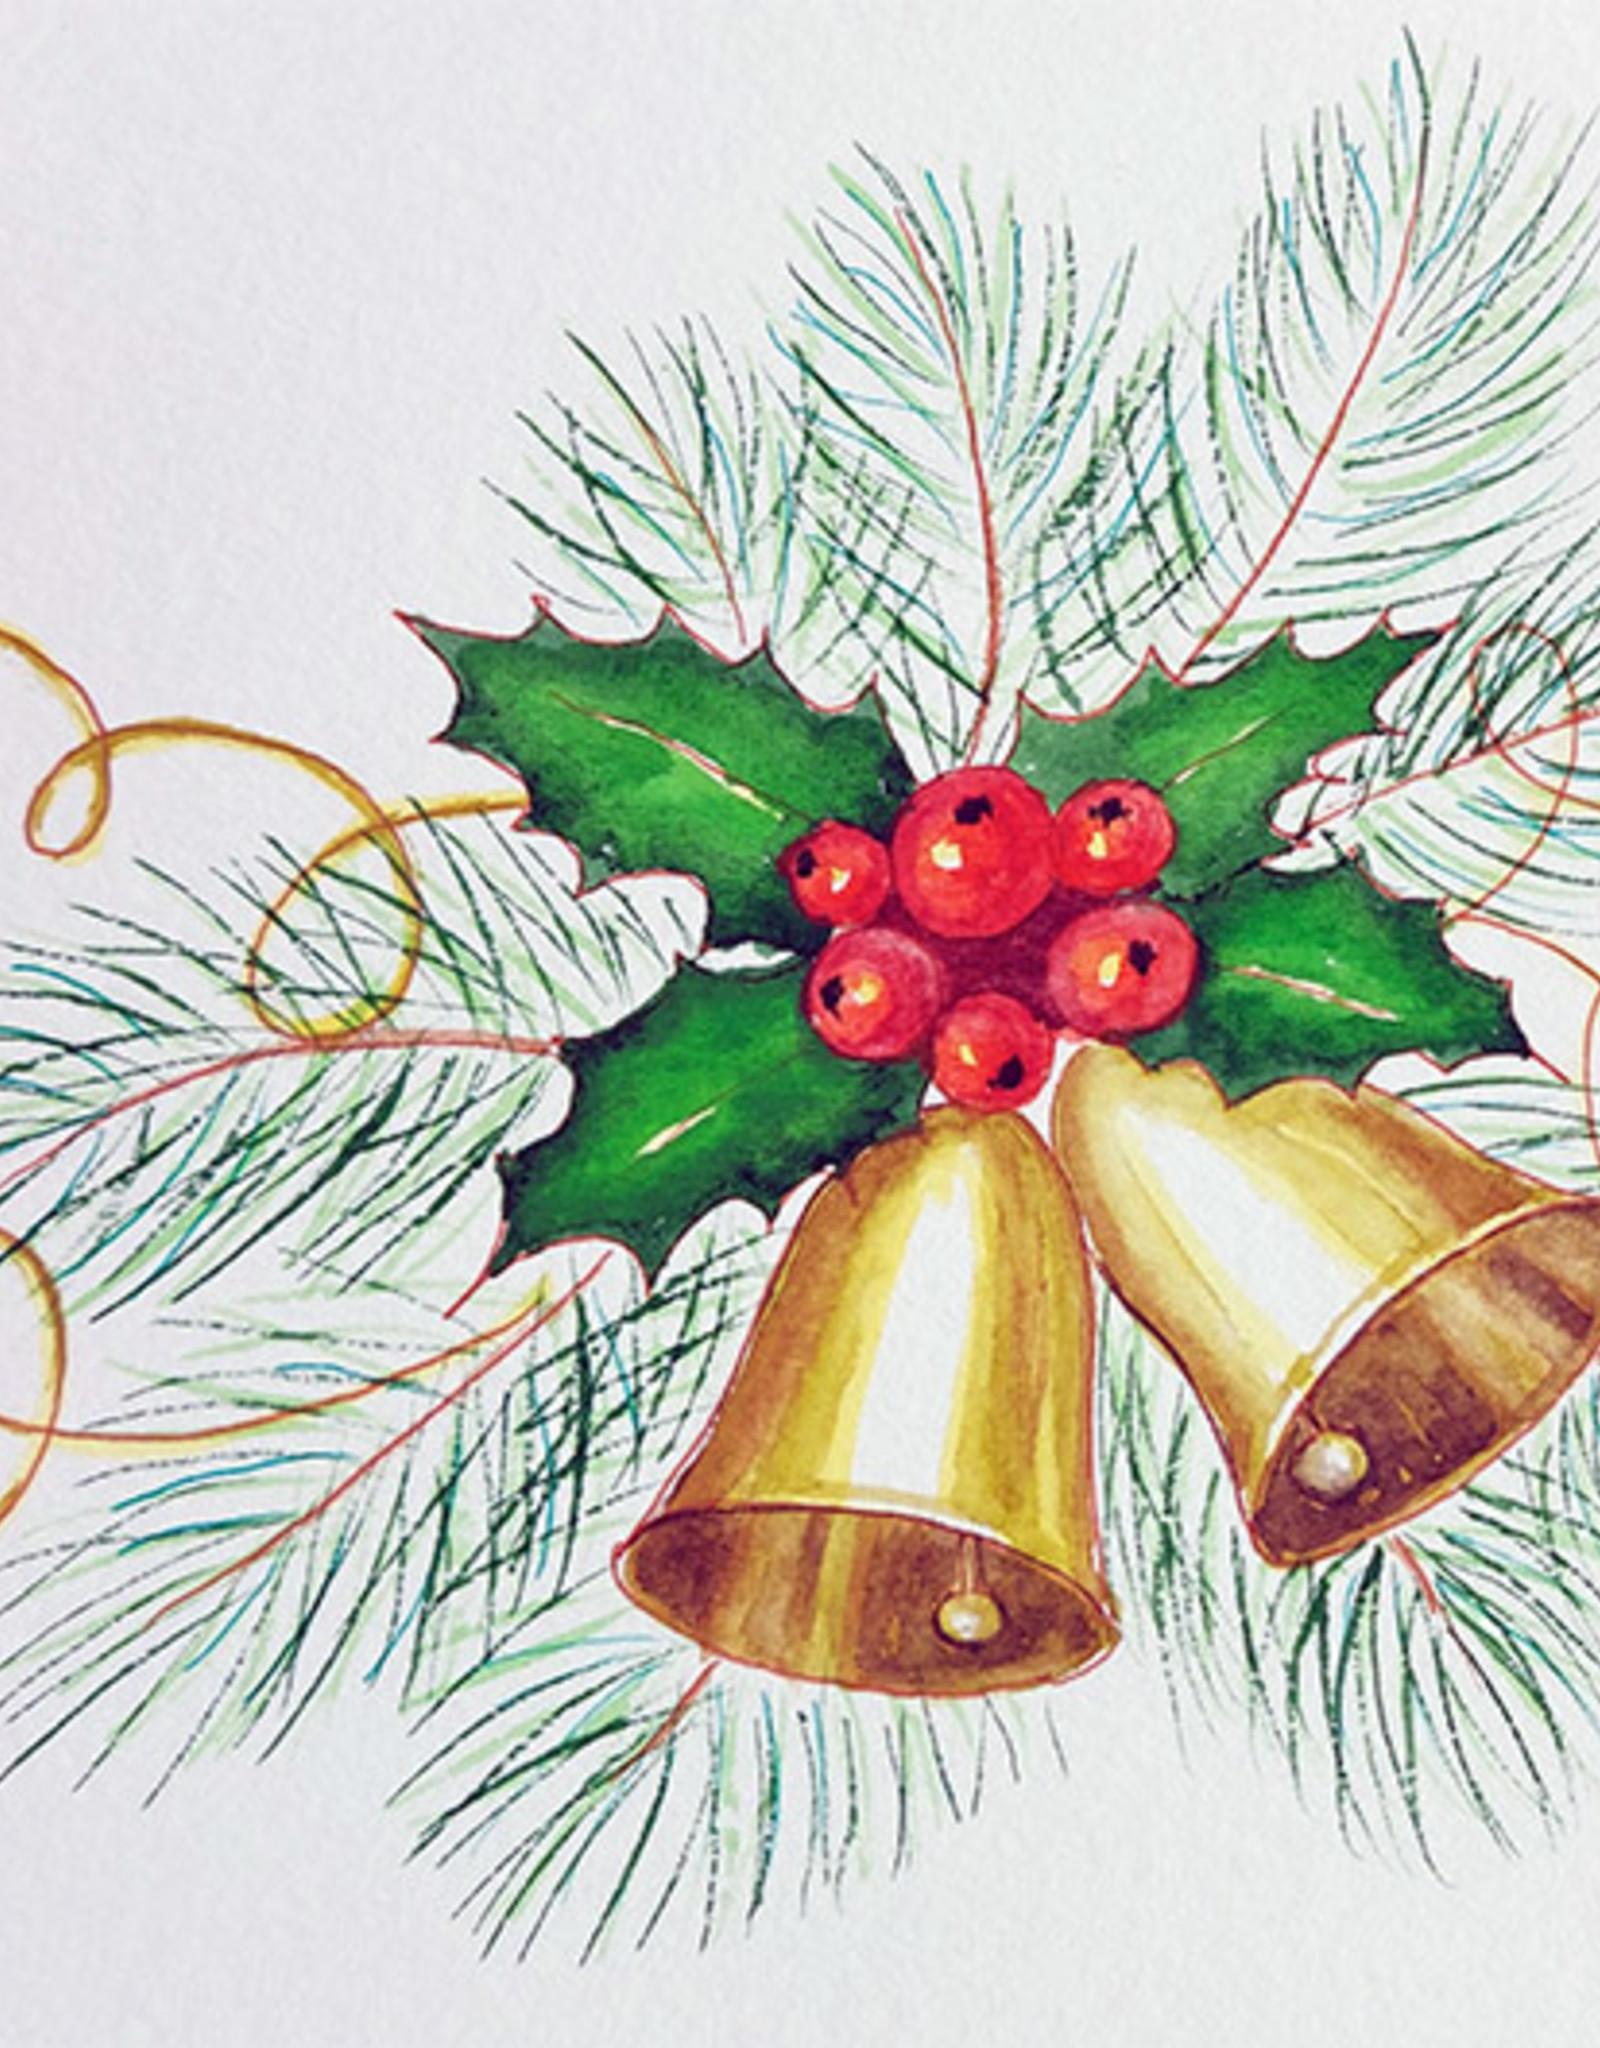 Tamara S Watercolour/Drawing Art Class Christmas Bells Greeting Card Wed Nov 24 1:00  to 2:00 pm